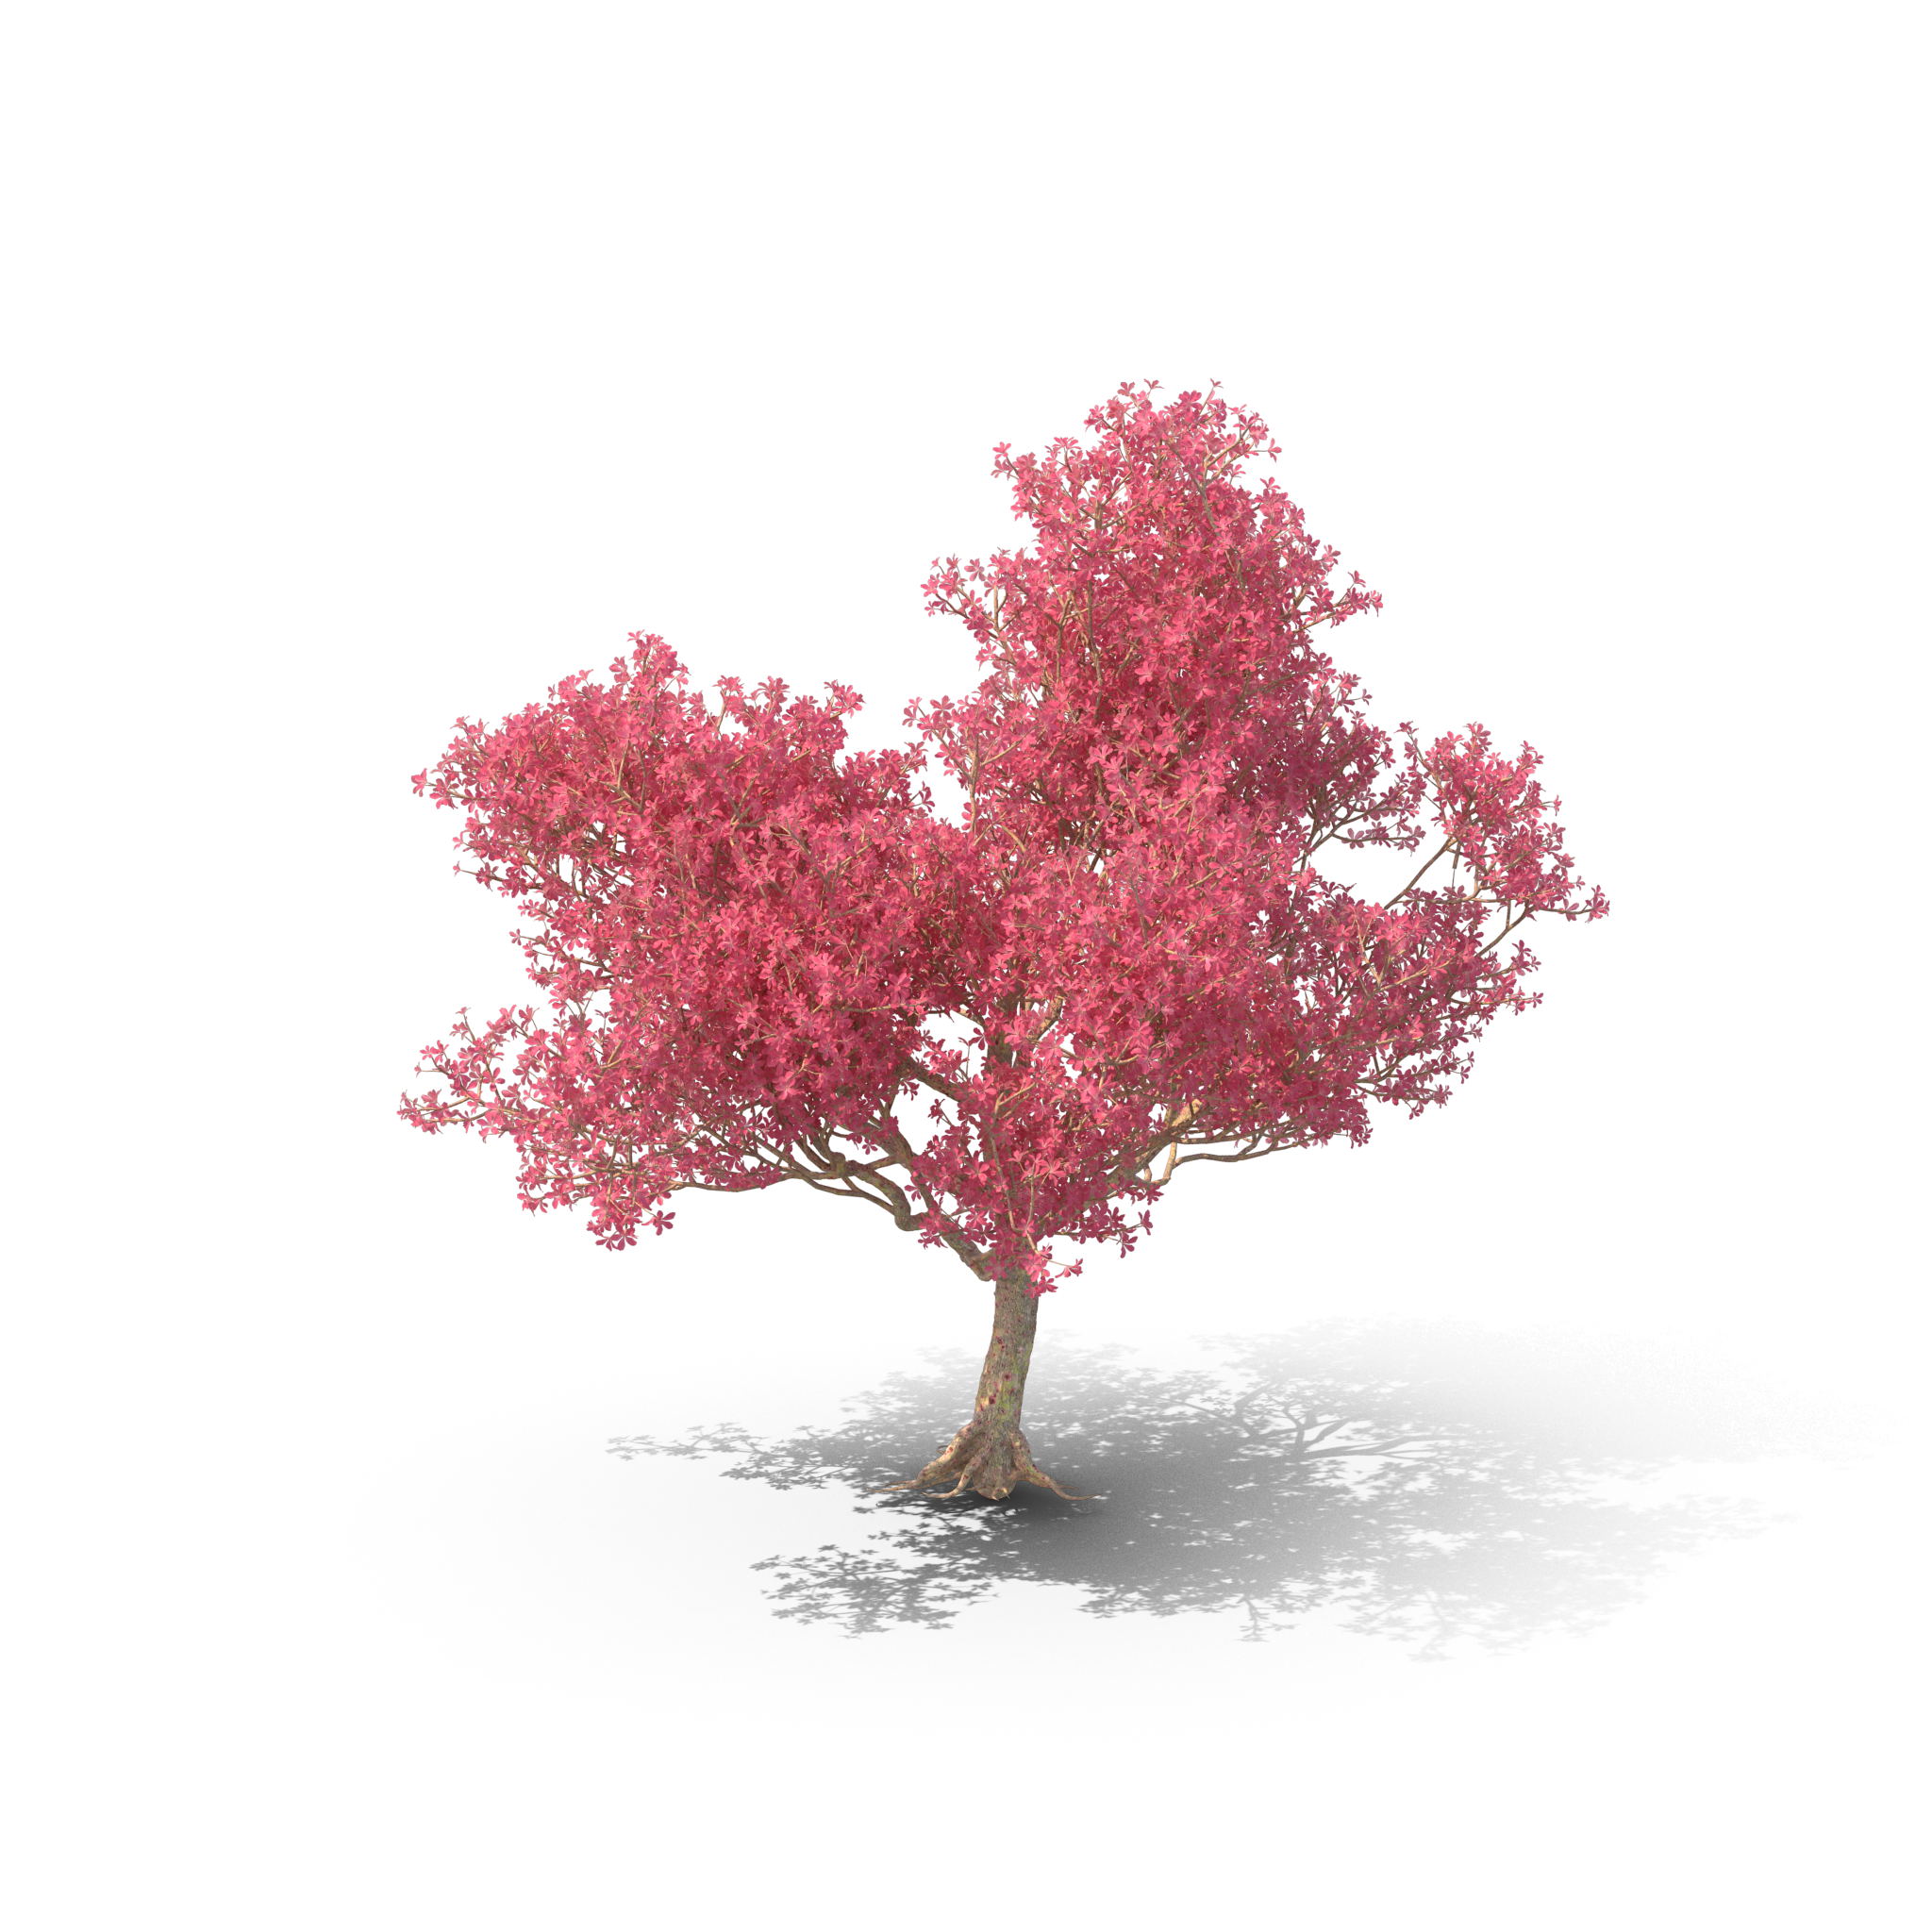 tree-trimming-companies-near-me